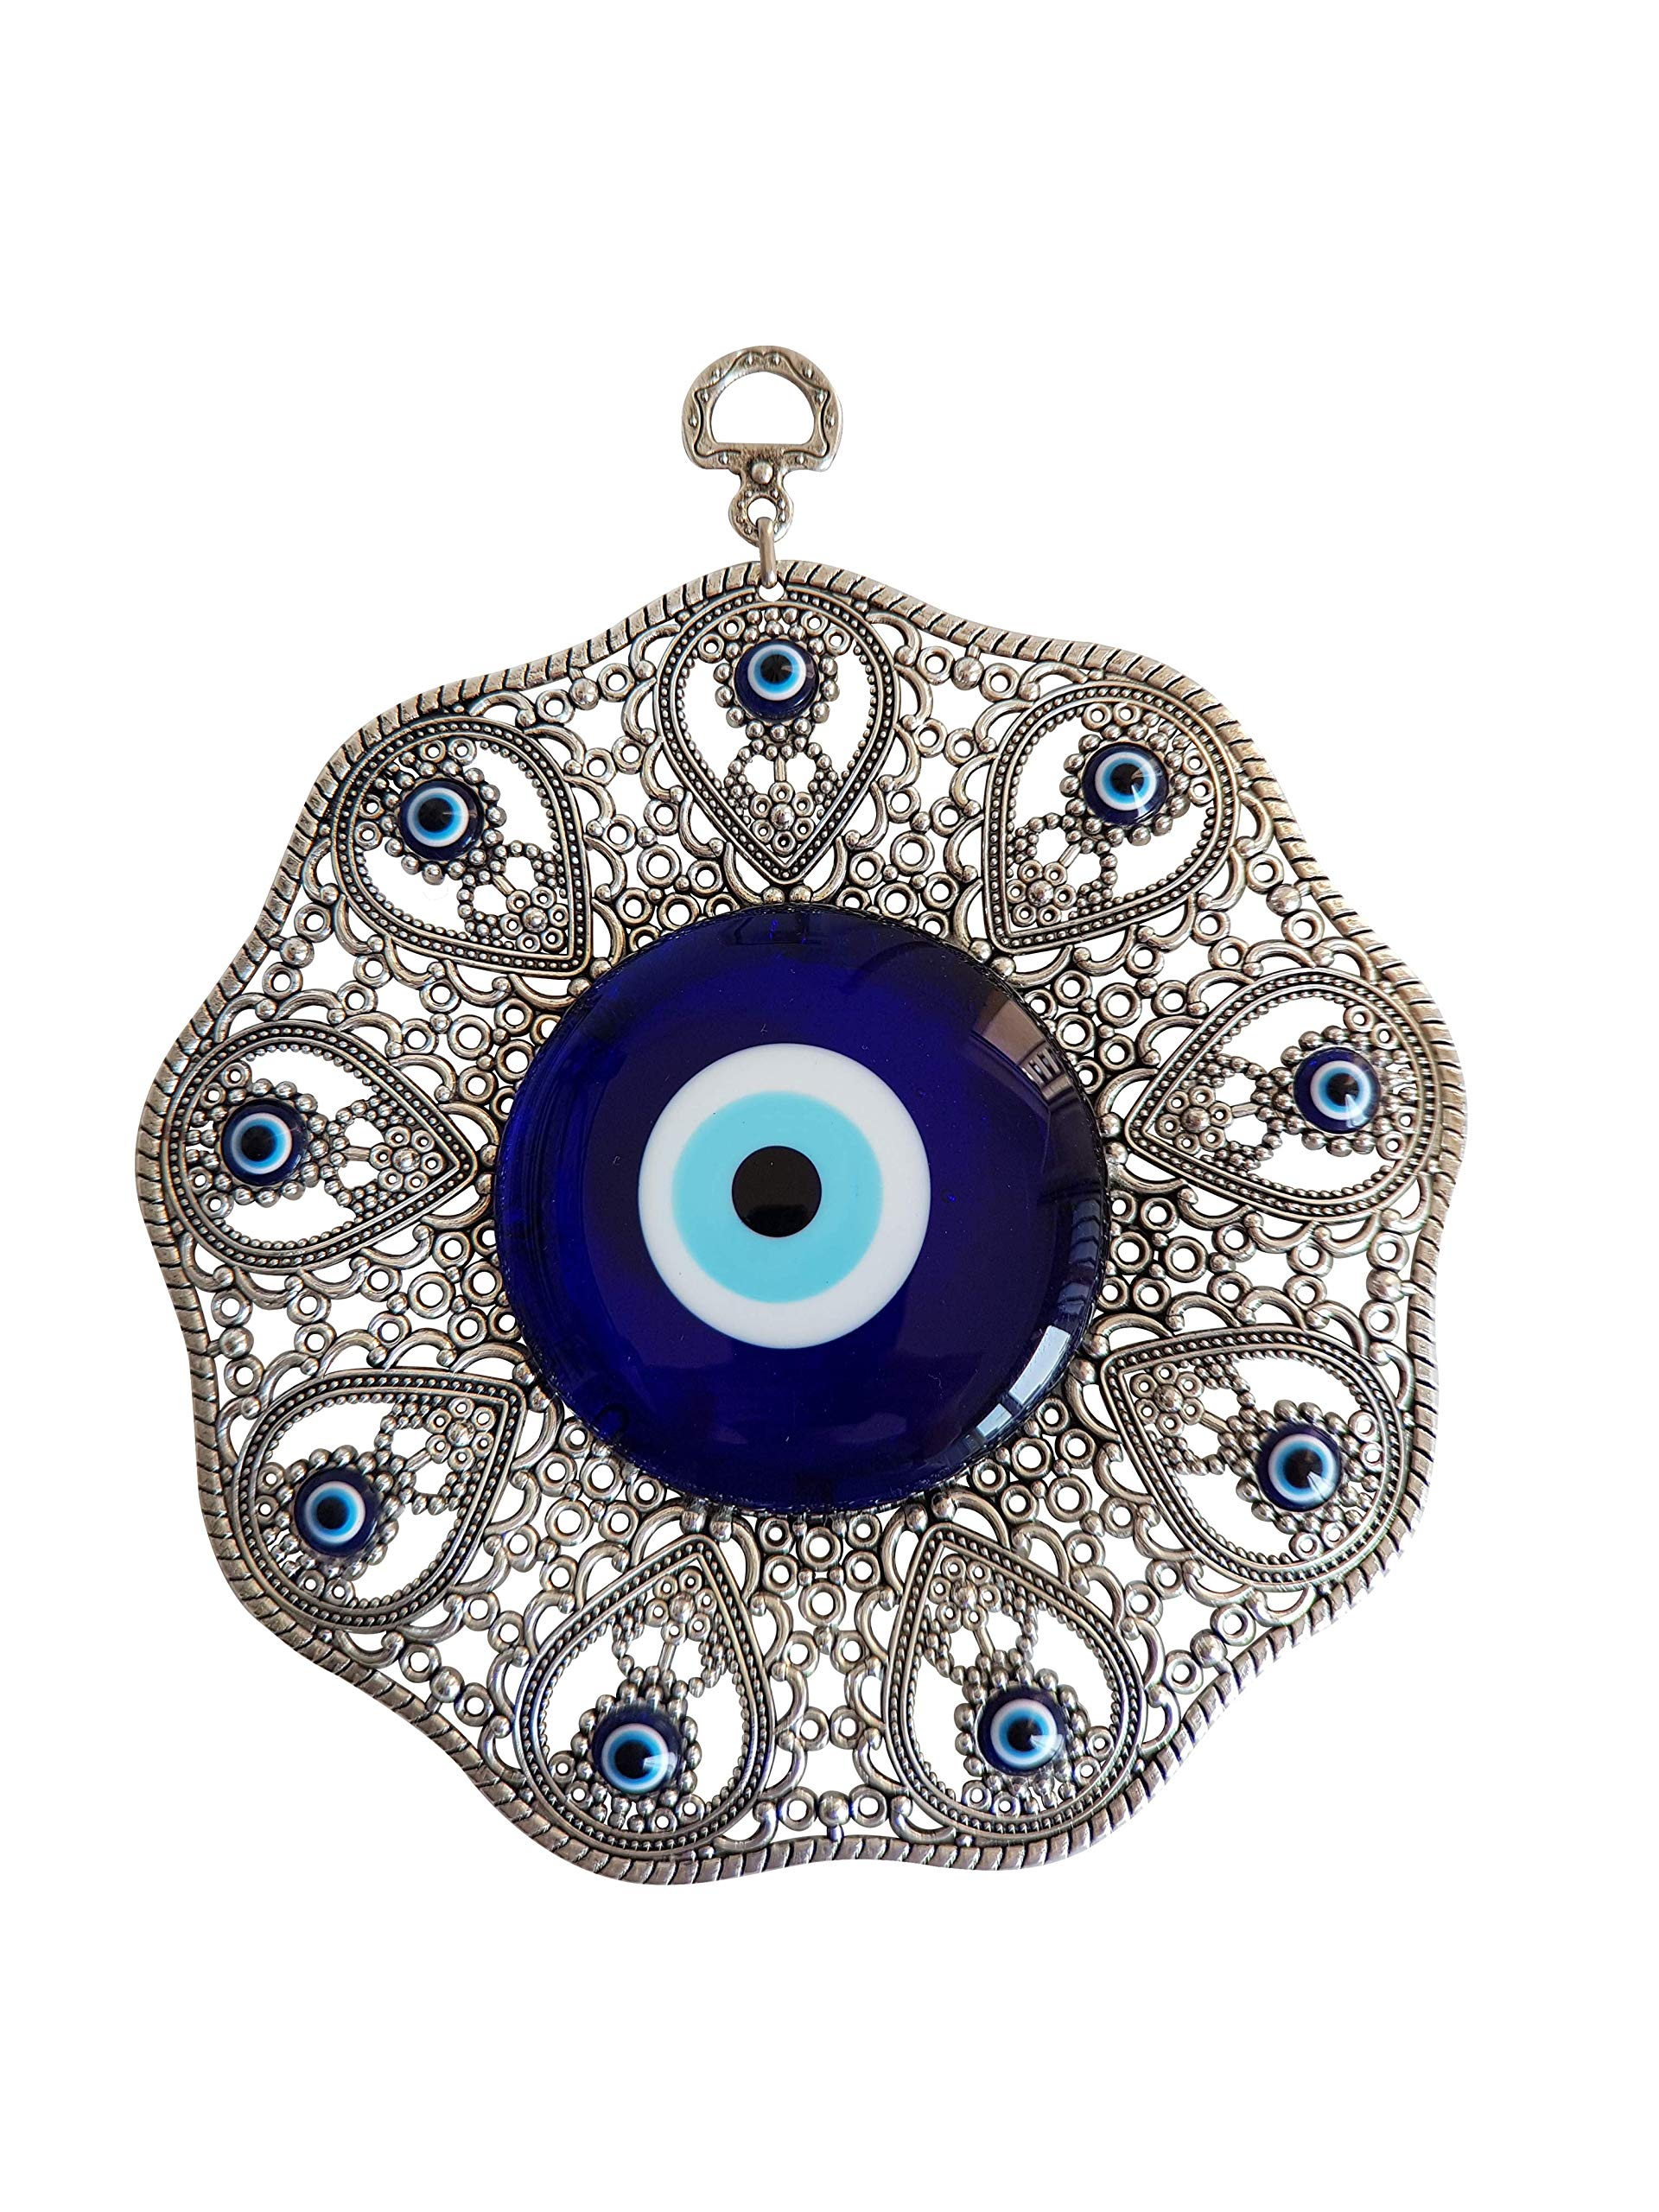 Turkish Big Glass Turkish Evil Eye Bead Home Protection Charm- Evil Eye Hangin Ornament Wall Decor (Silver)